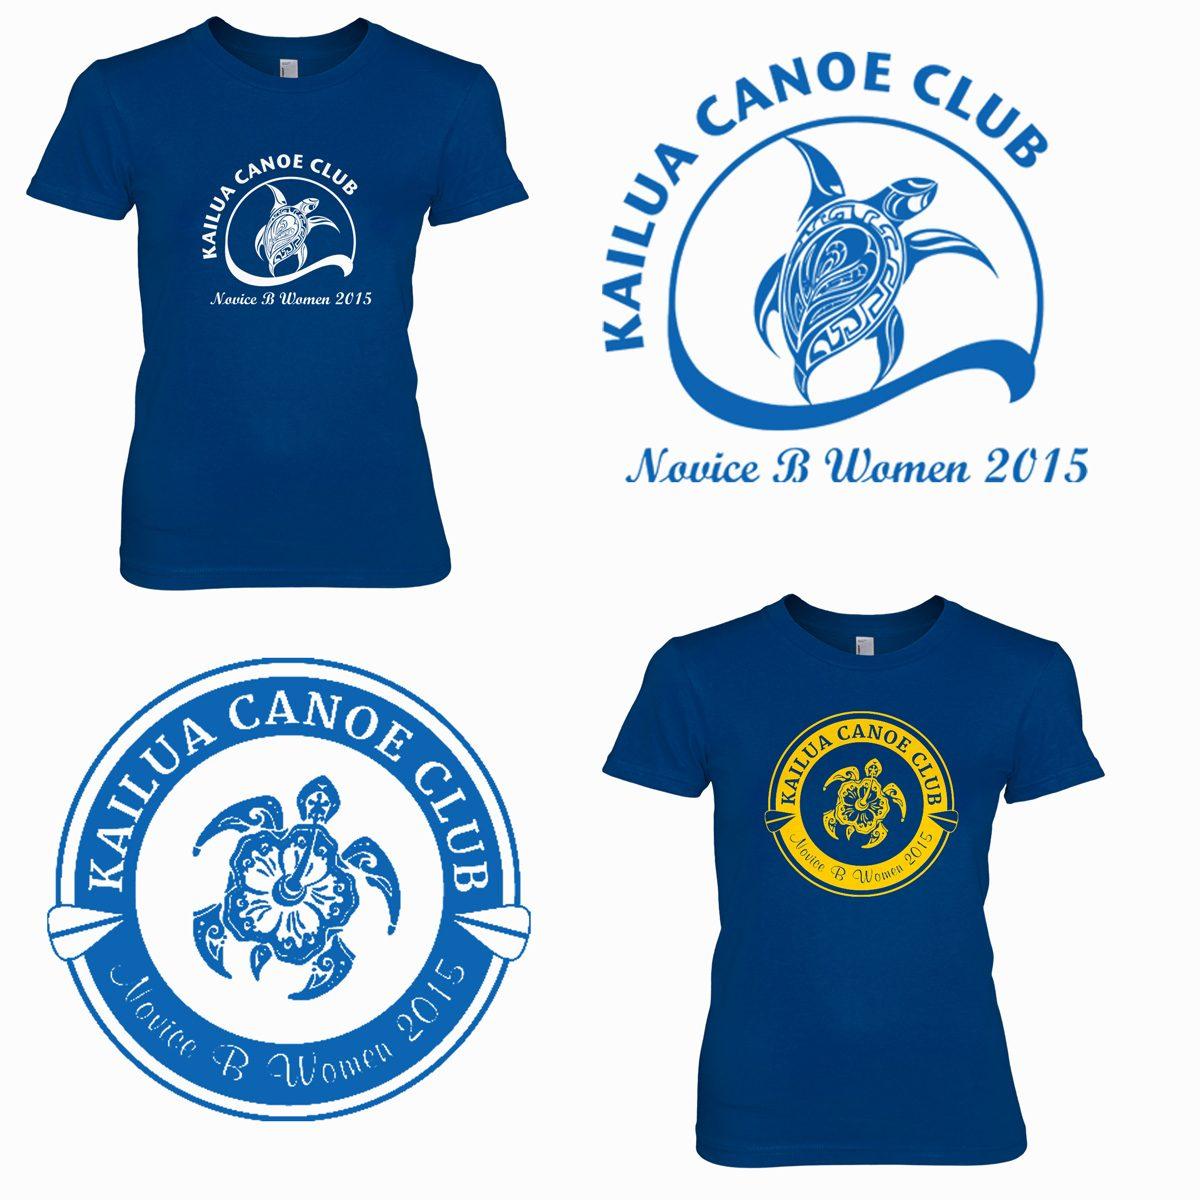 Two alternative design ideas for the Novice B Women's section of the Kailua Canoe Club